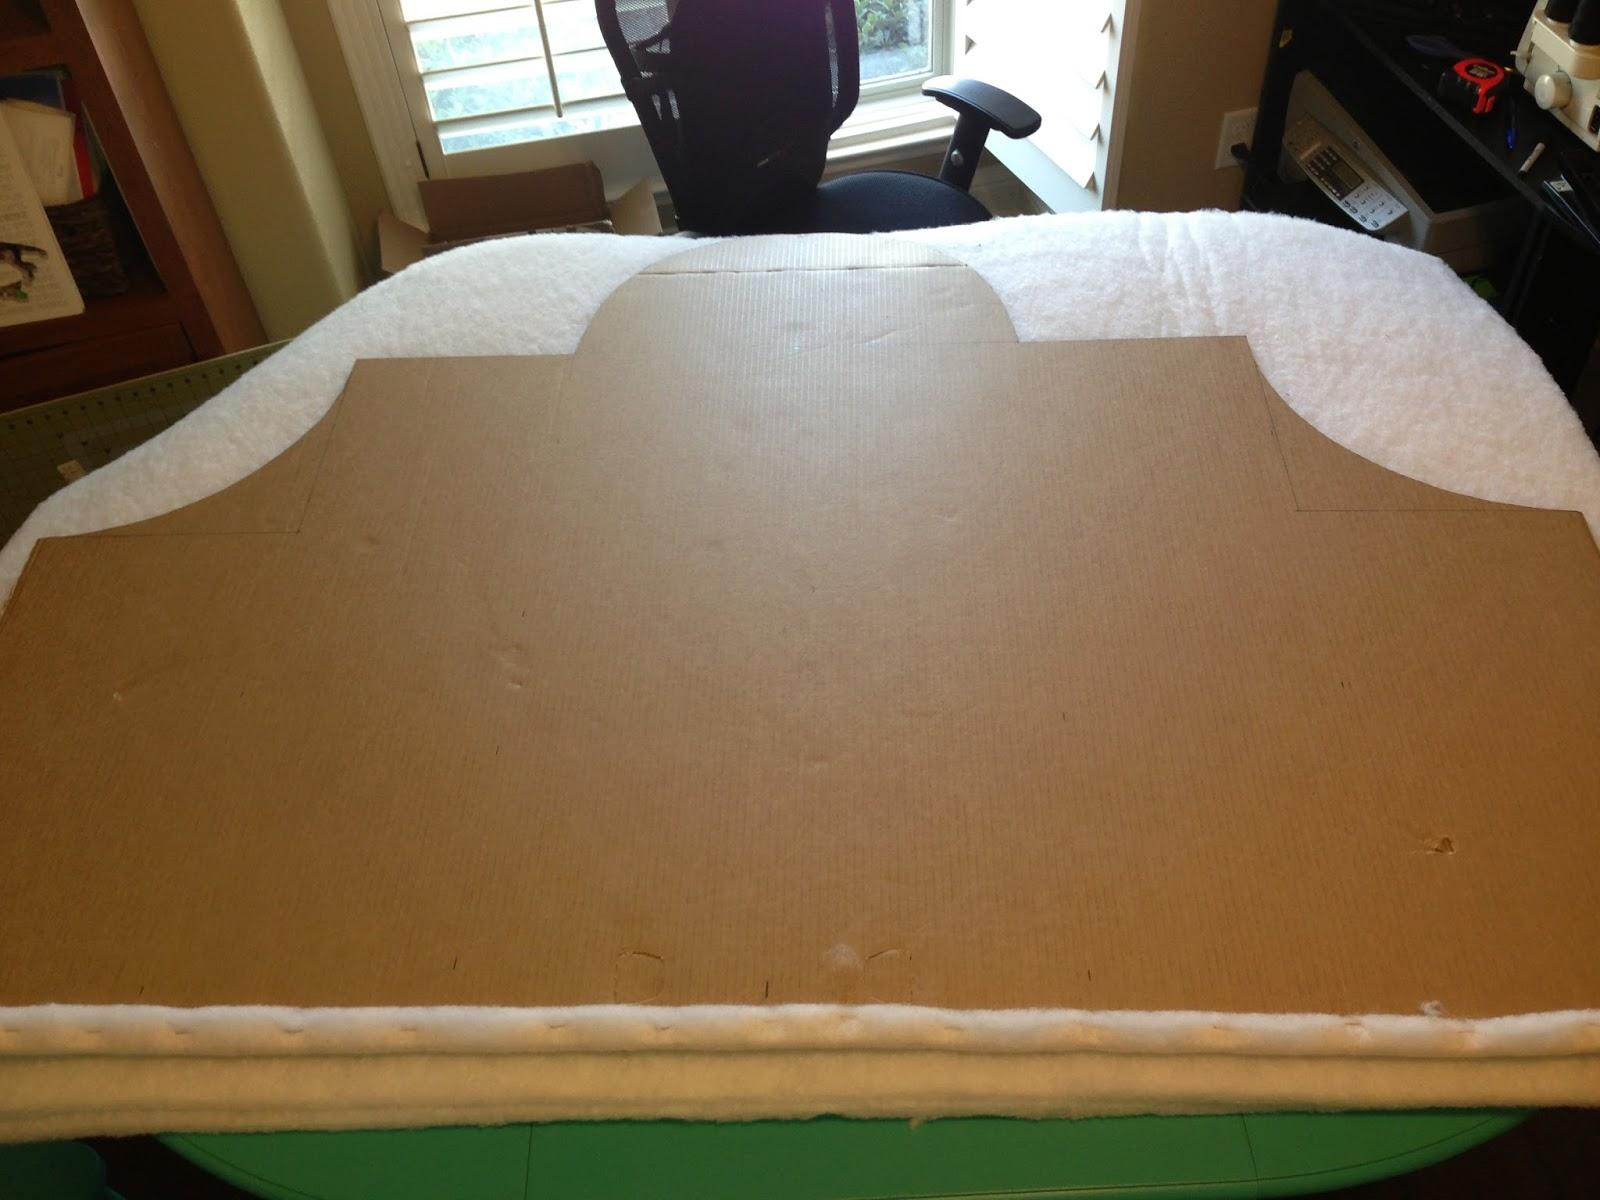 Part 1 Diy Headboard Using Cardboard Instead Of Wood